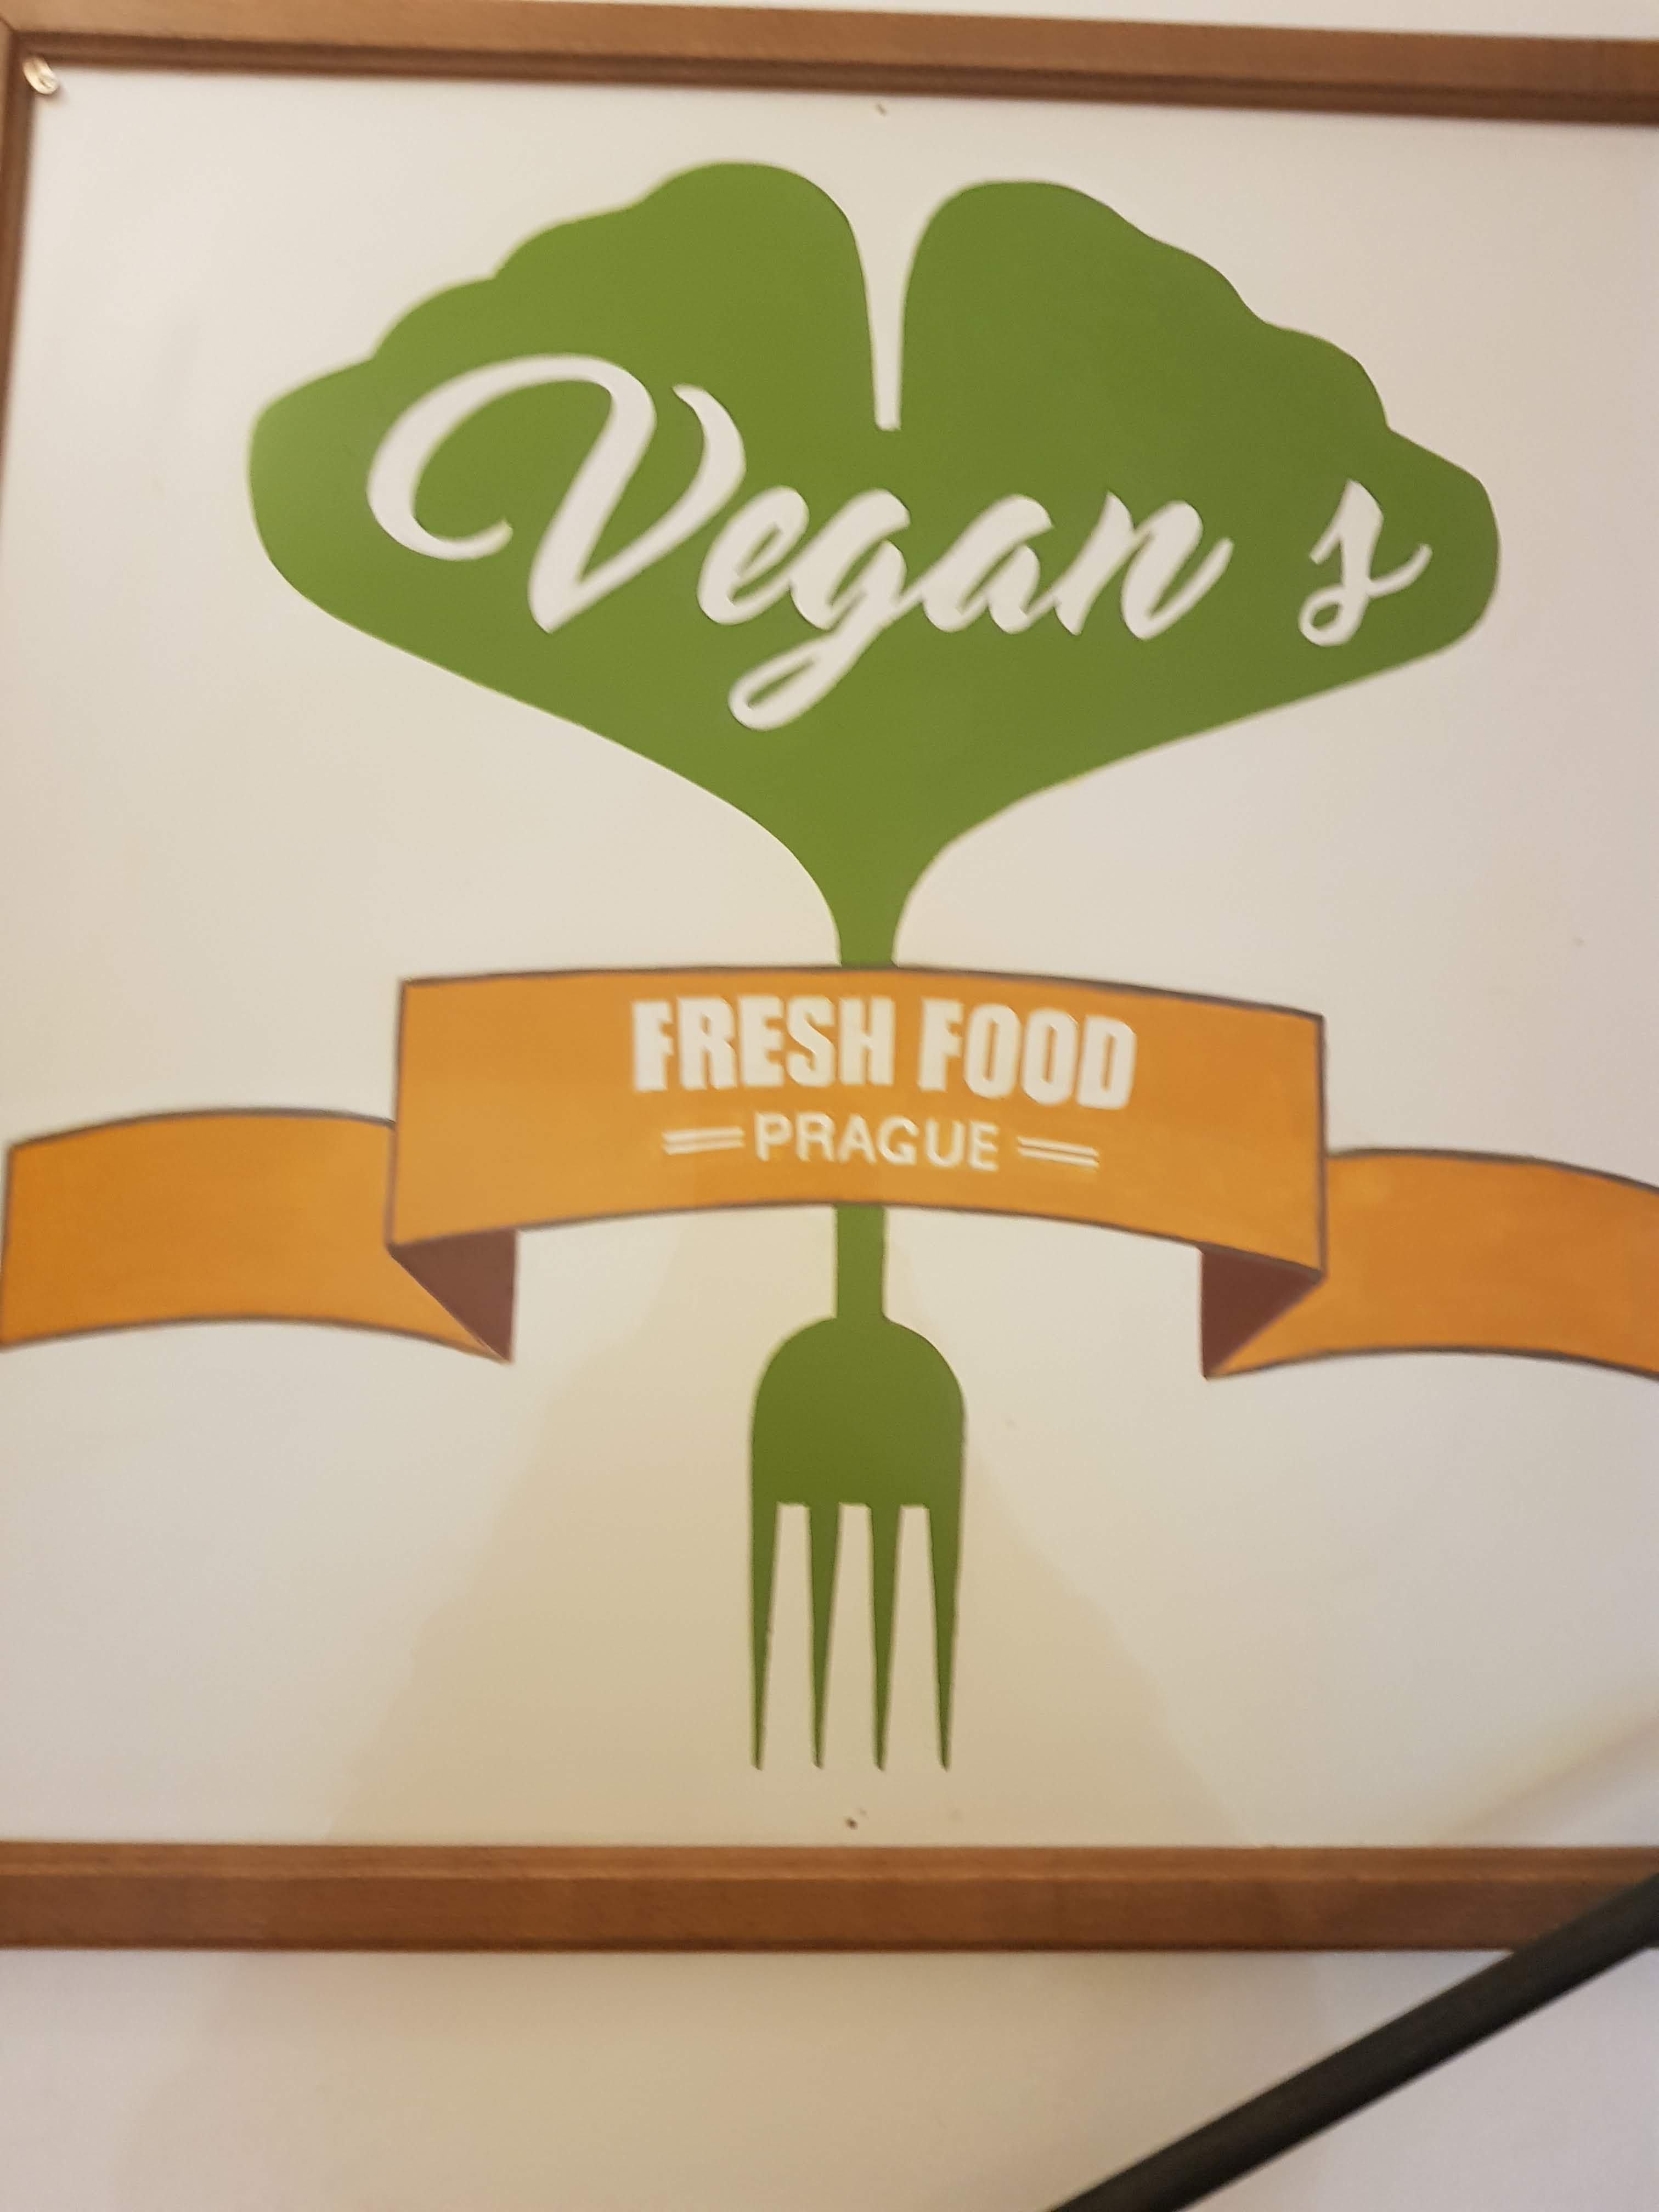 Vegans, Prag